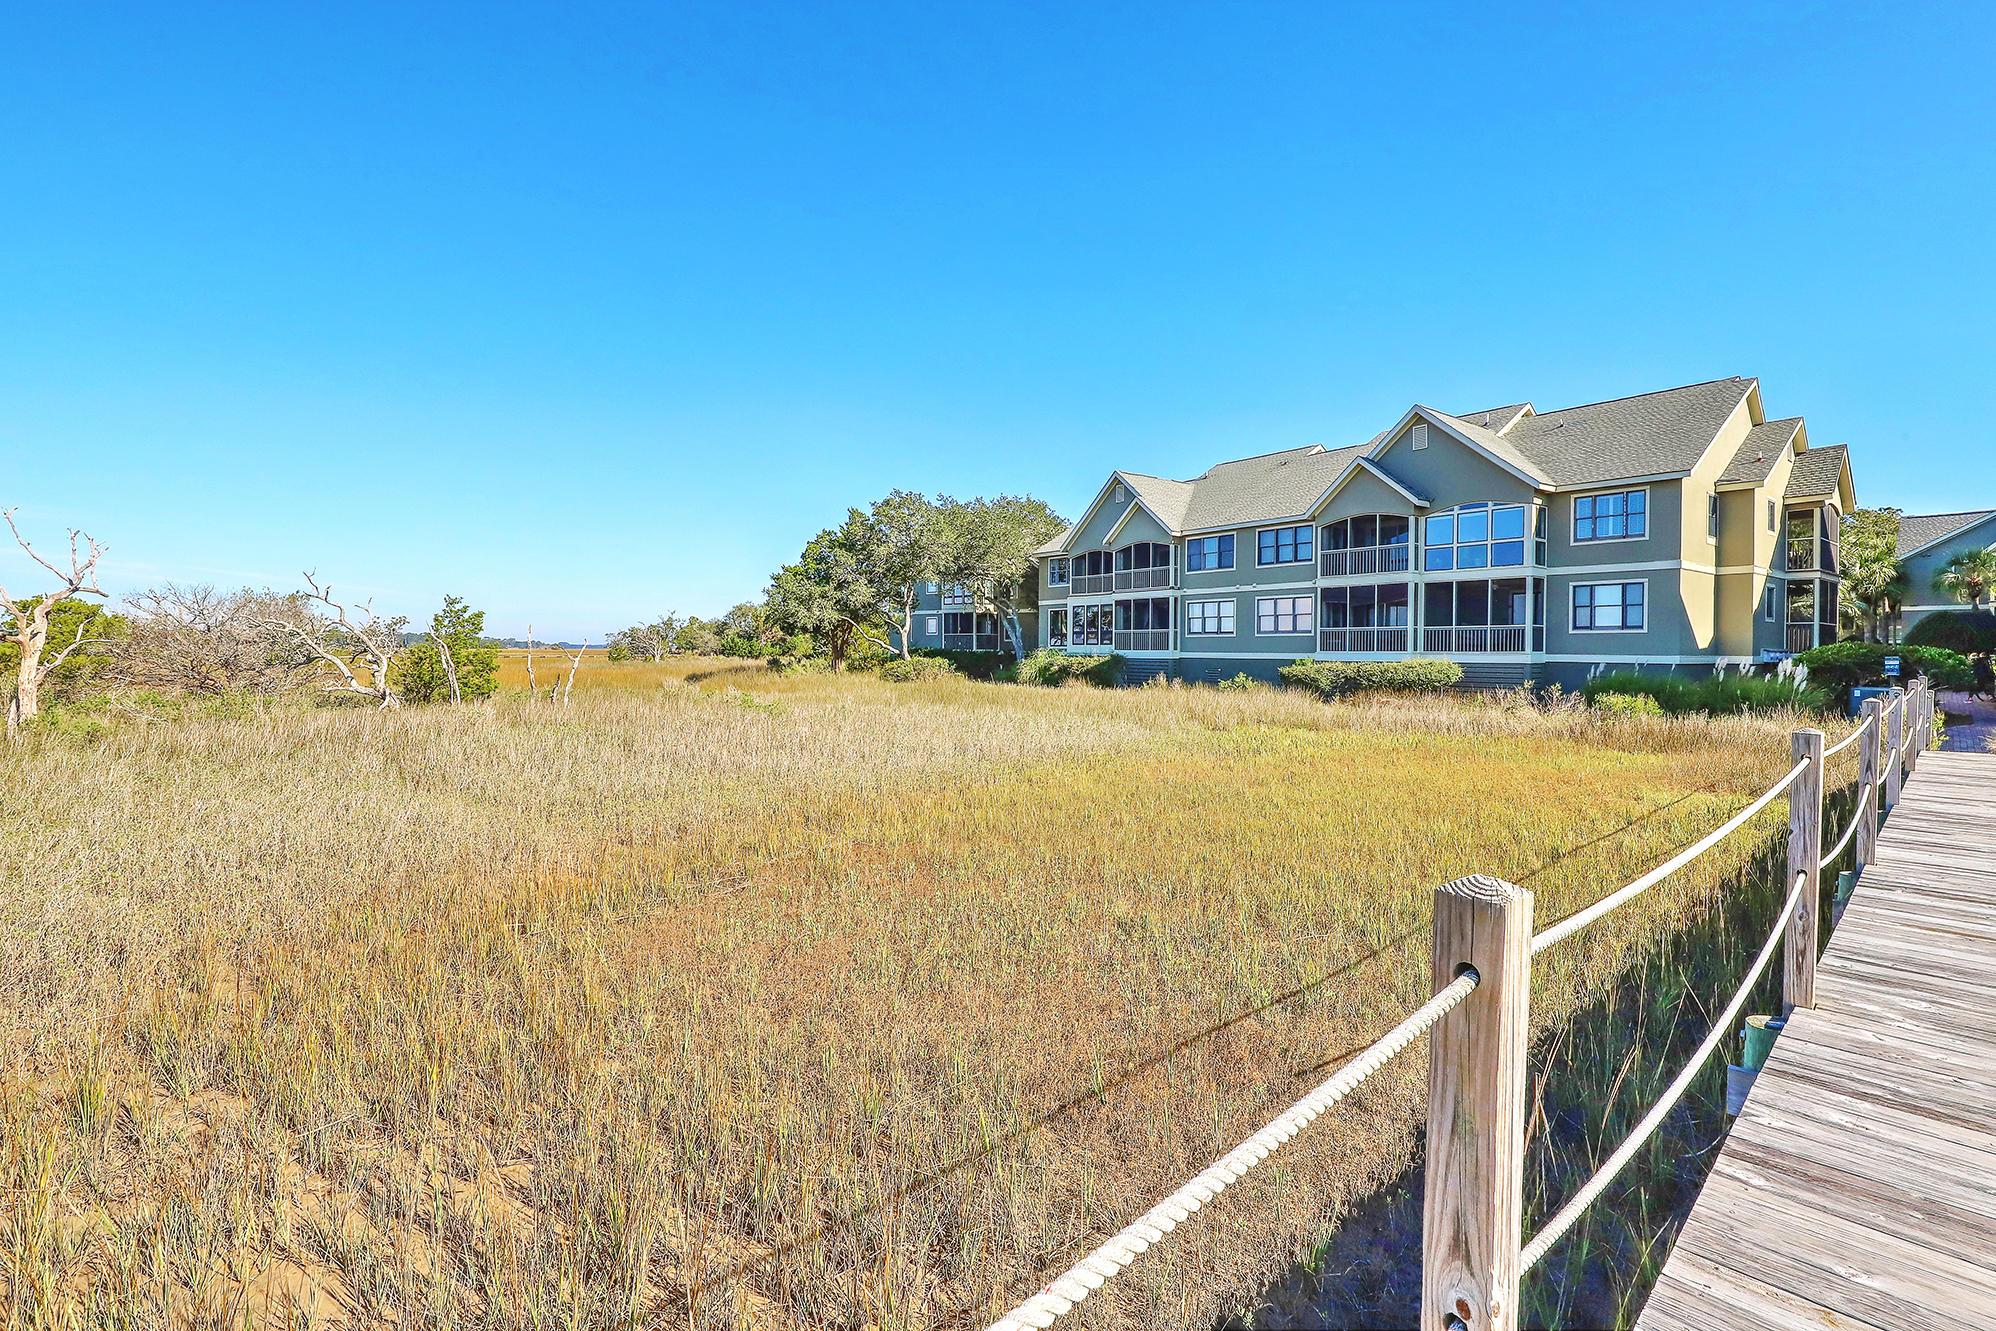 Seabrook Island Homes For Sale - 2103 Landfall, Johns Island, SC - 26